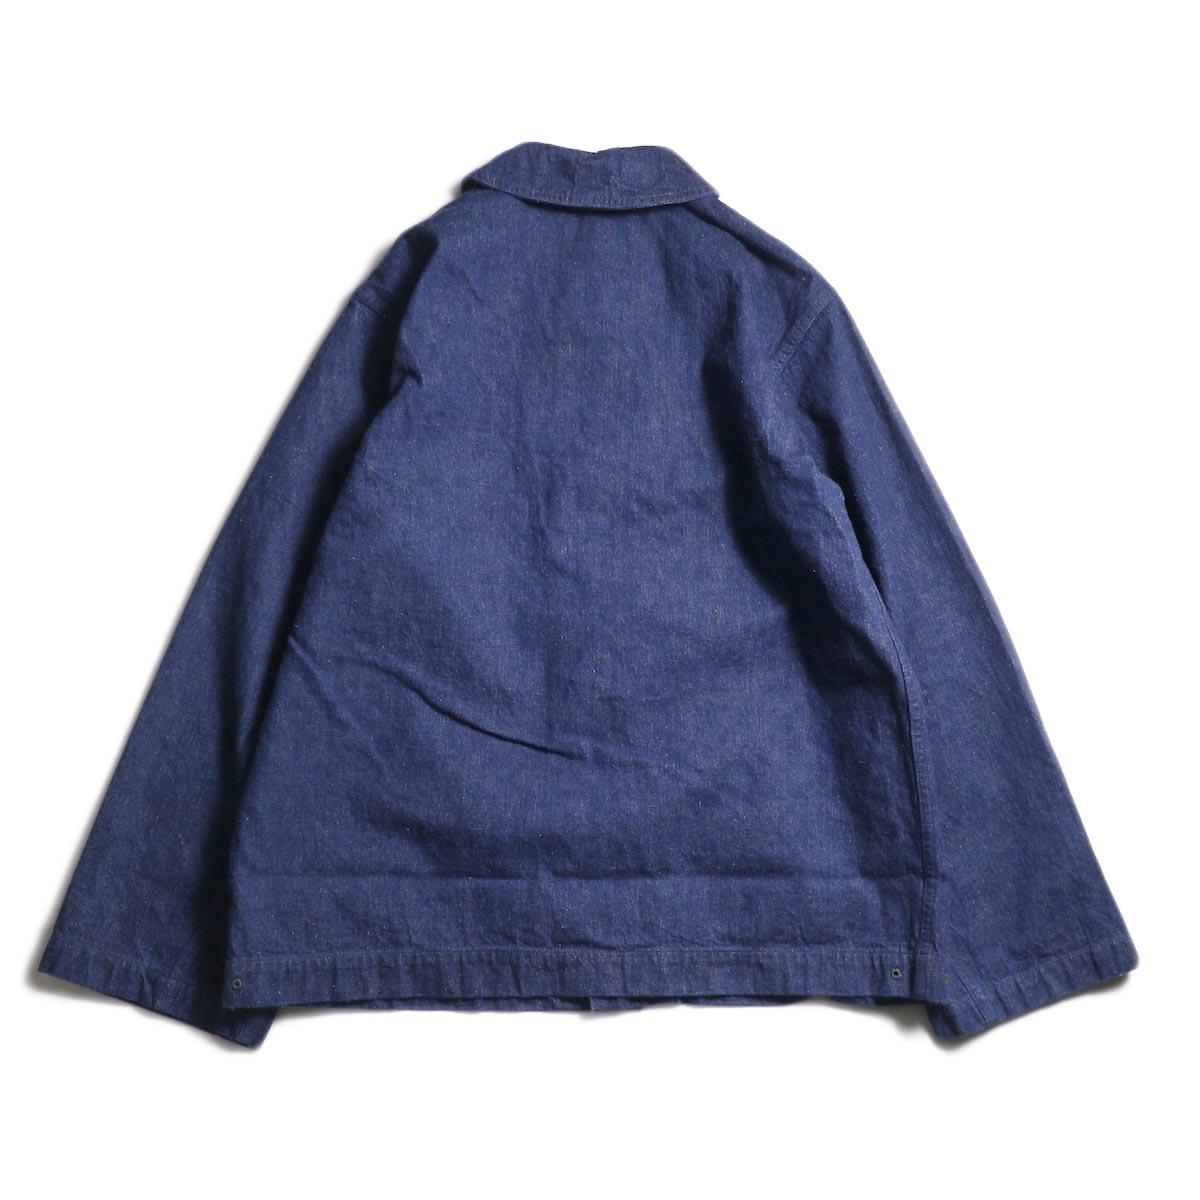 orSlow / US NAVY SHAWL COLLAR JACKET (One Wash)背面